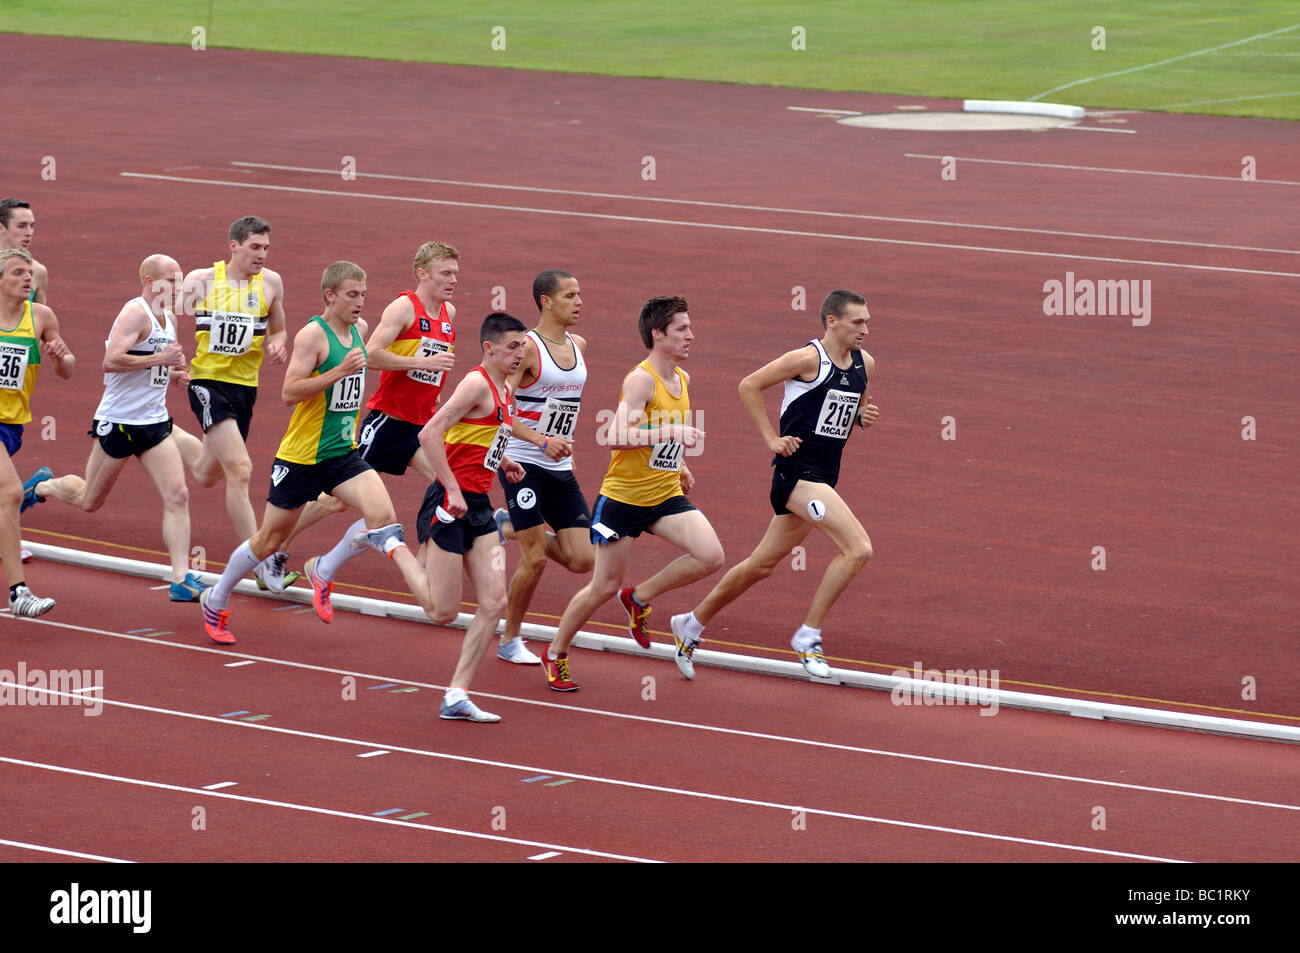 Runners in 1500 metres race - Stock Image